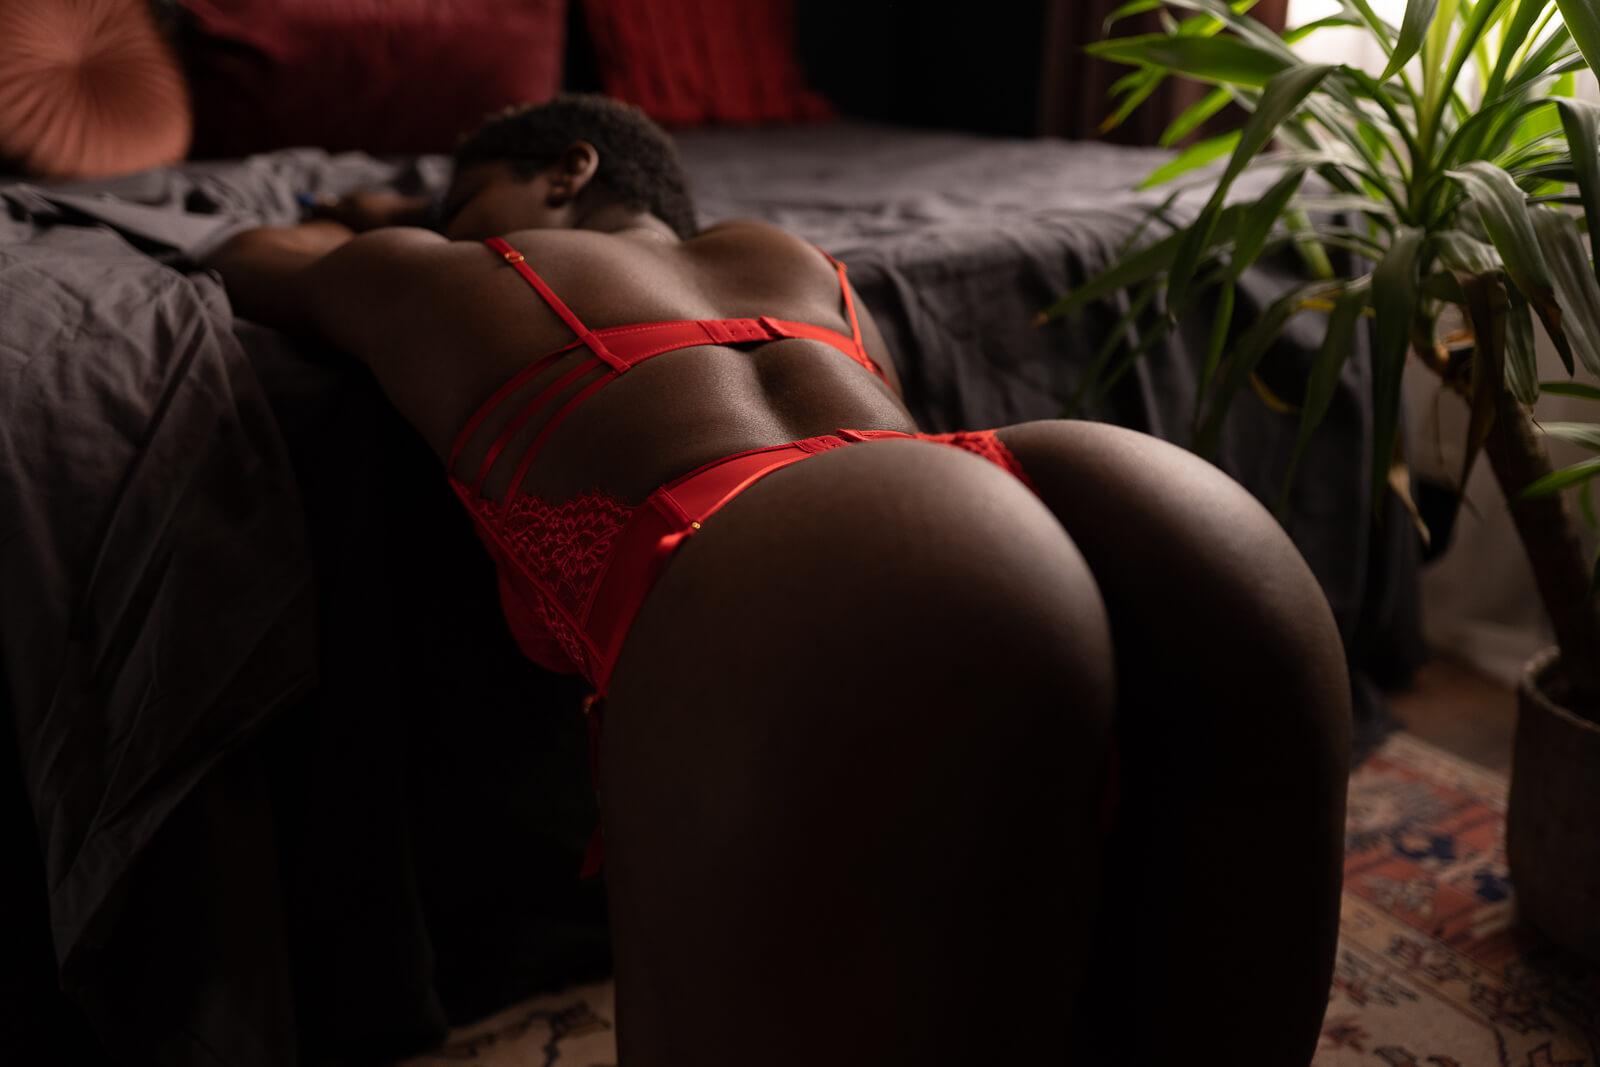 Vrouw in rode lingerie